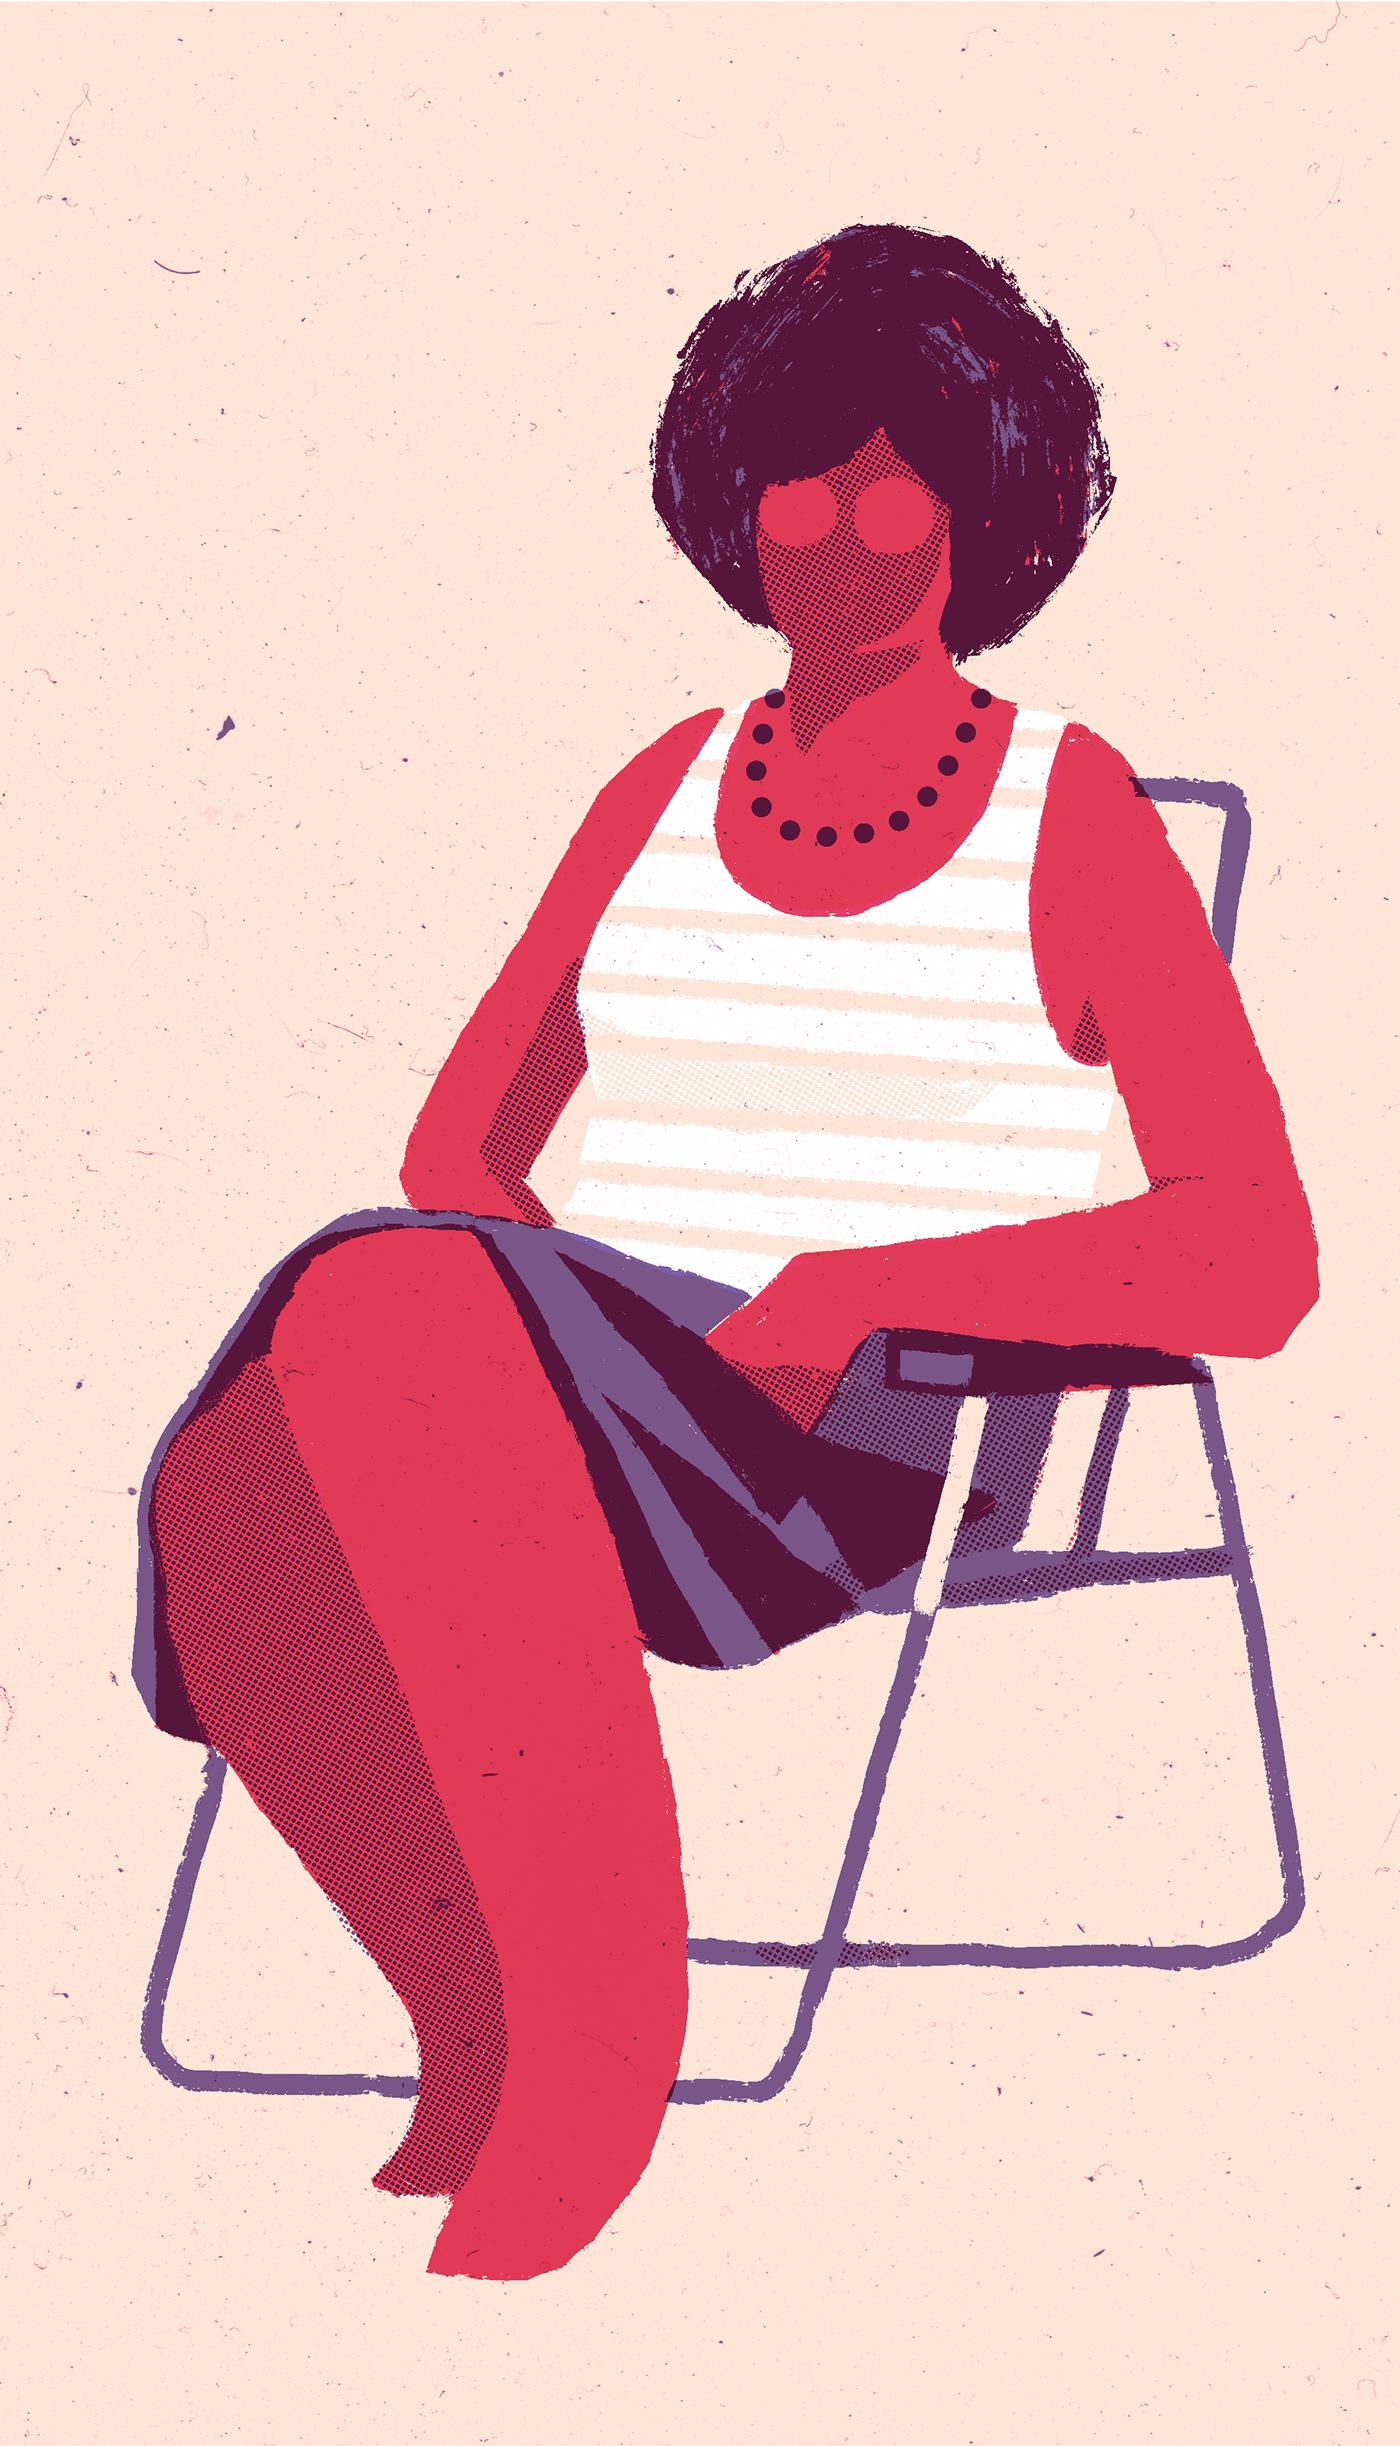 3-tone chair girl risograph screenprint vintage